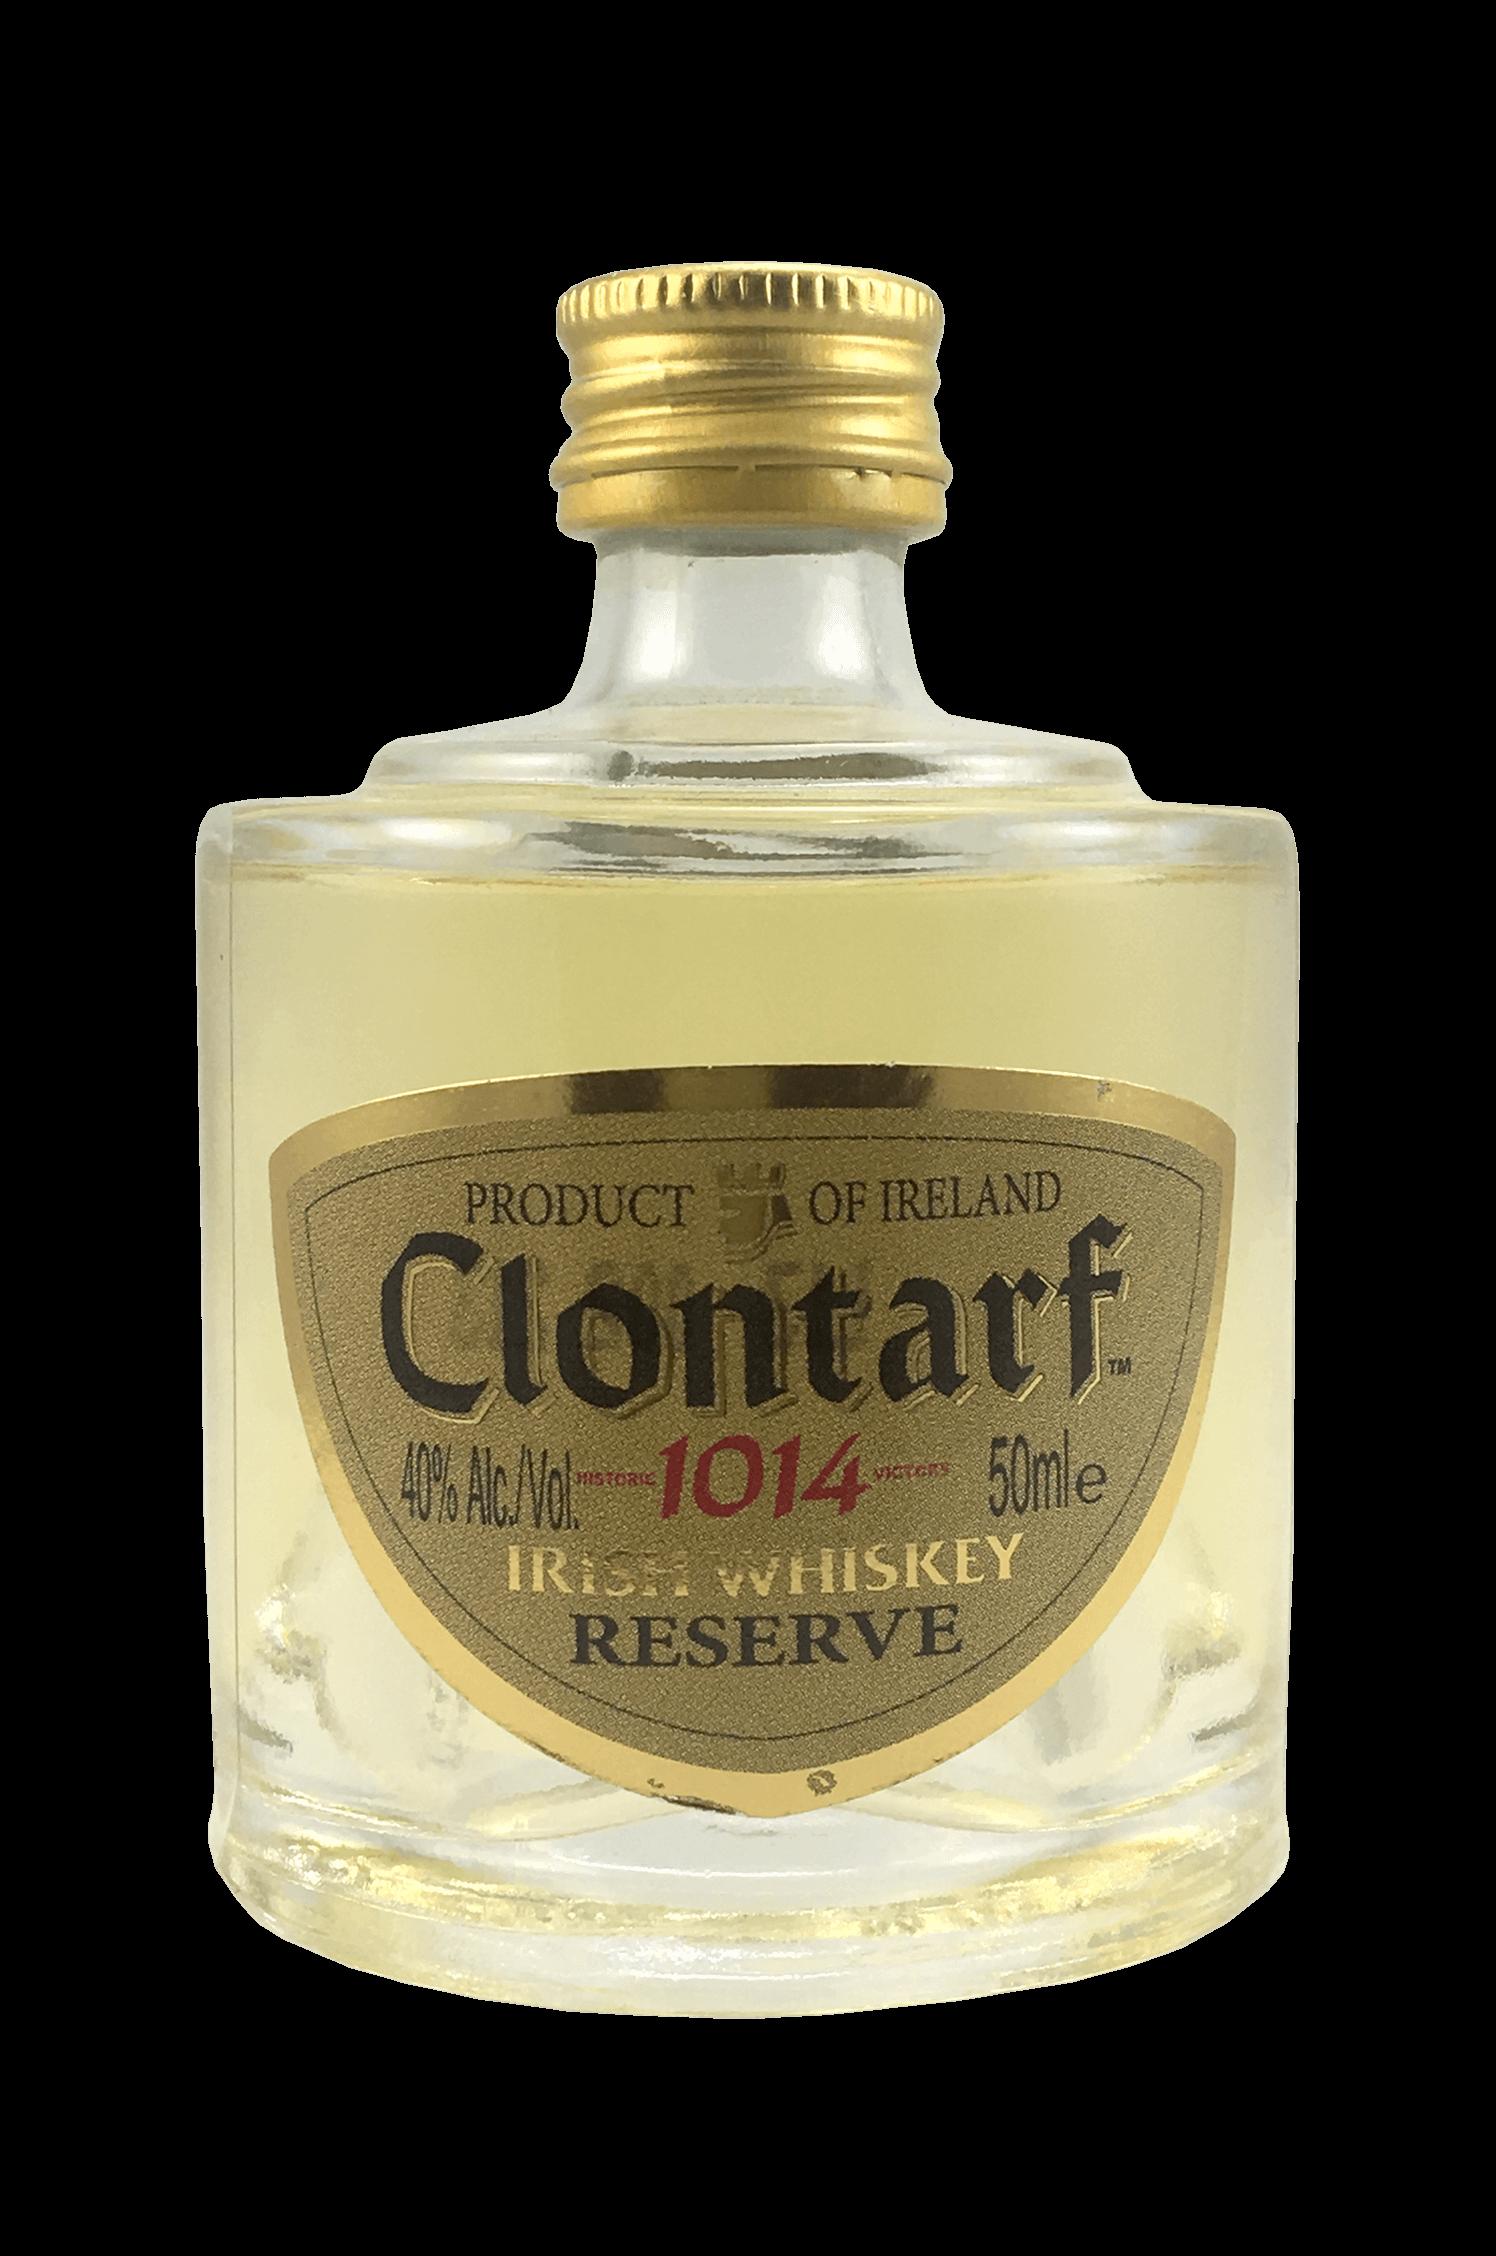 Clontarf Reserve